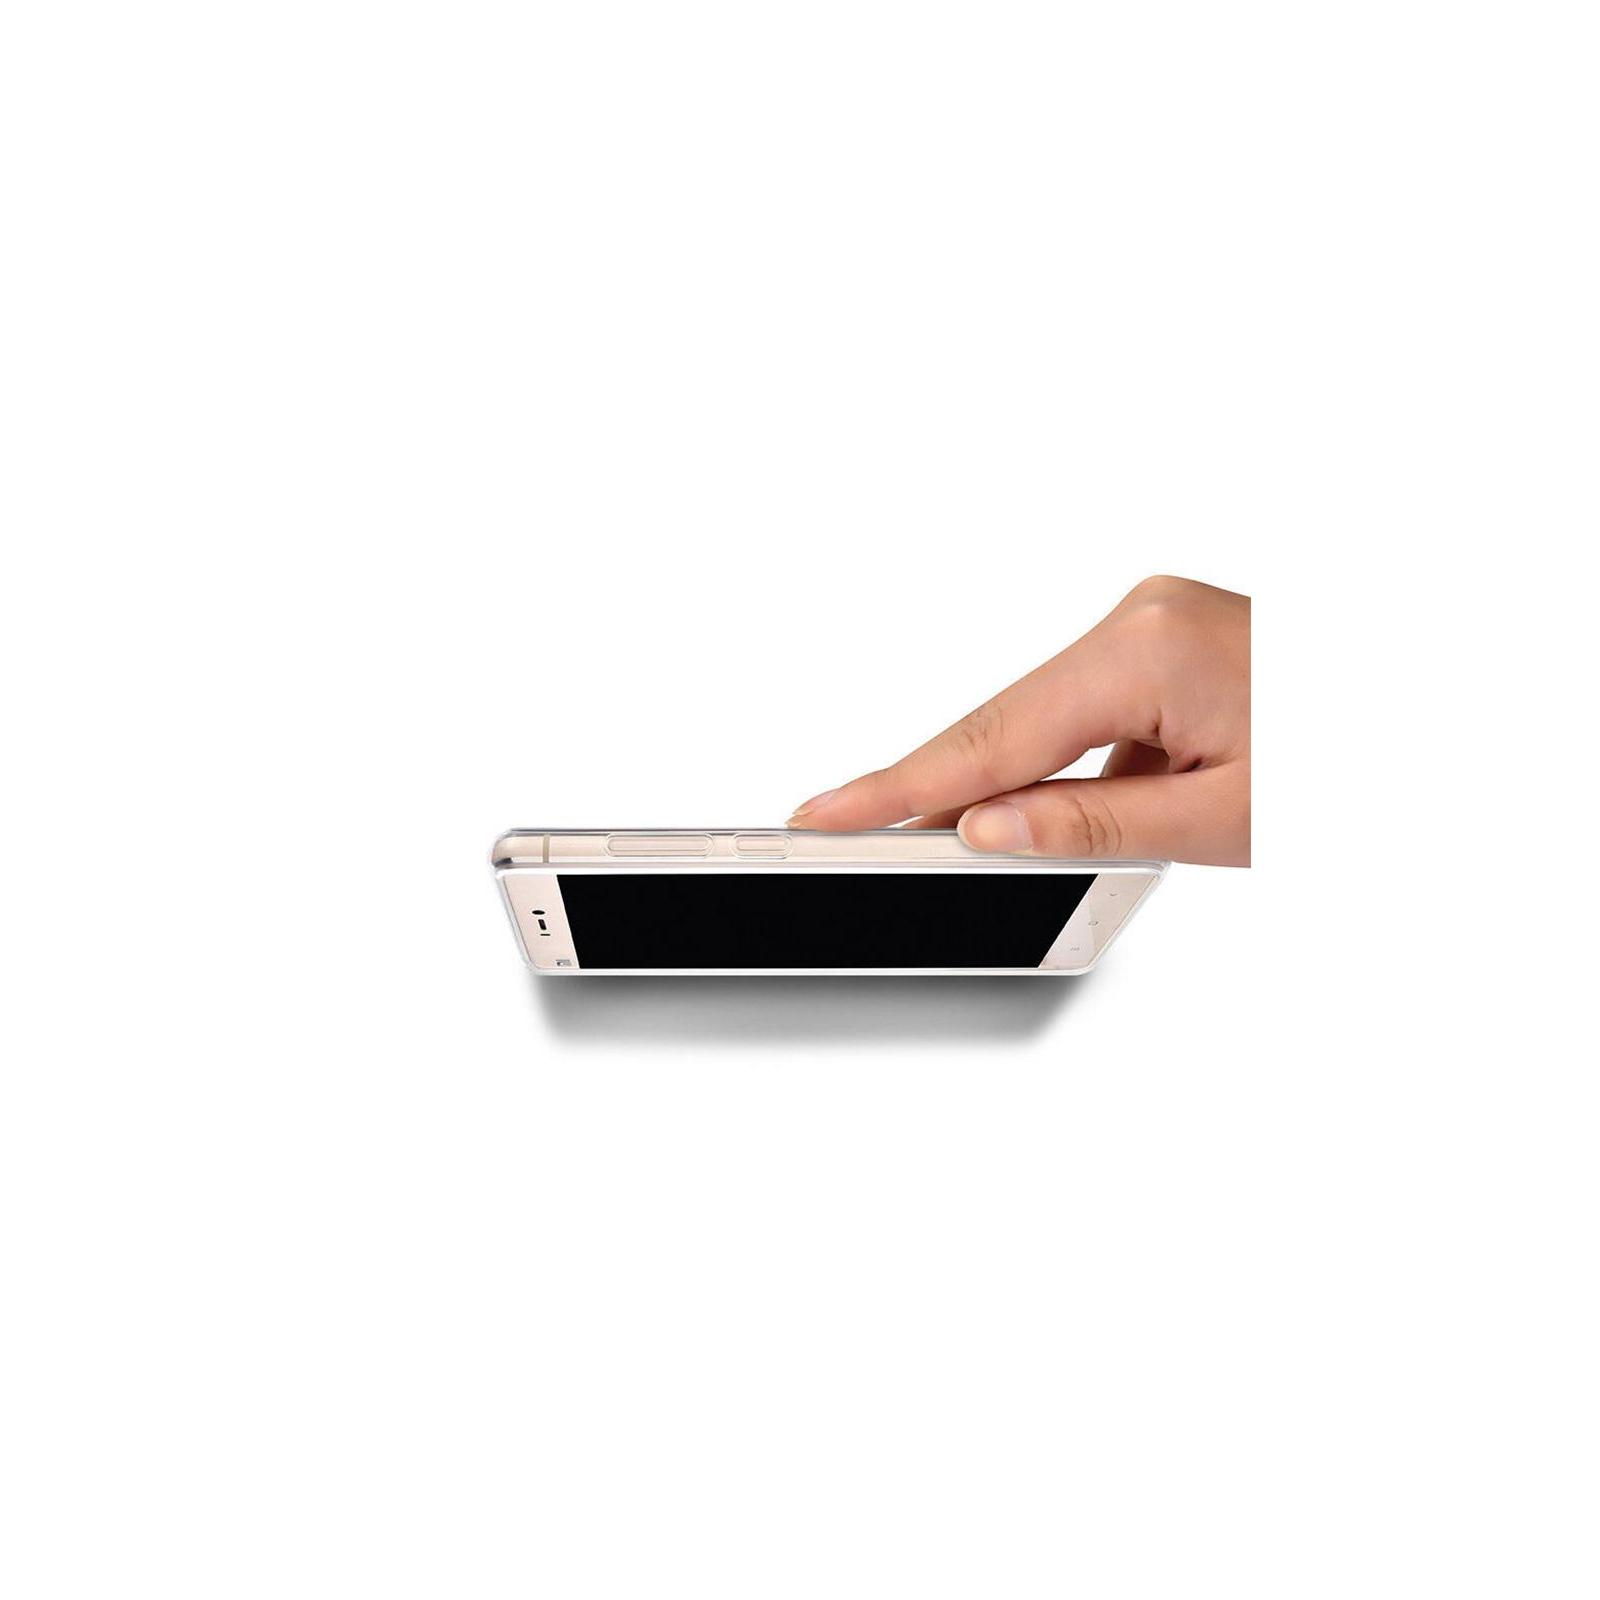 Чехол для моб. телефона SmartCase Xiaomi Redmi 4A TPU Clear (SC-RMI4A) изображение 3